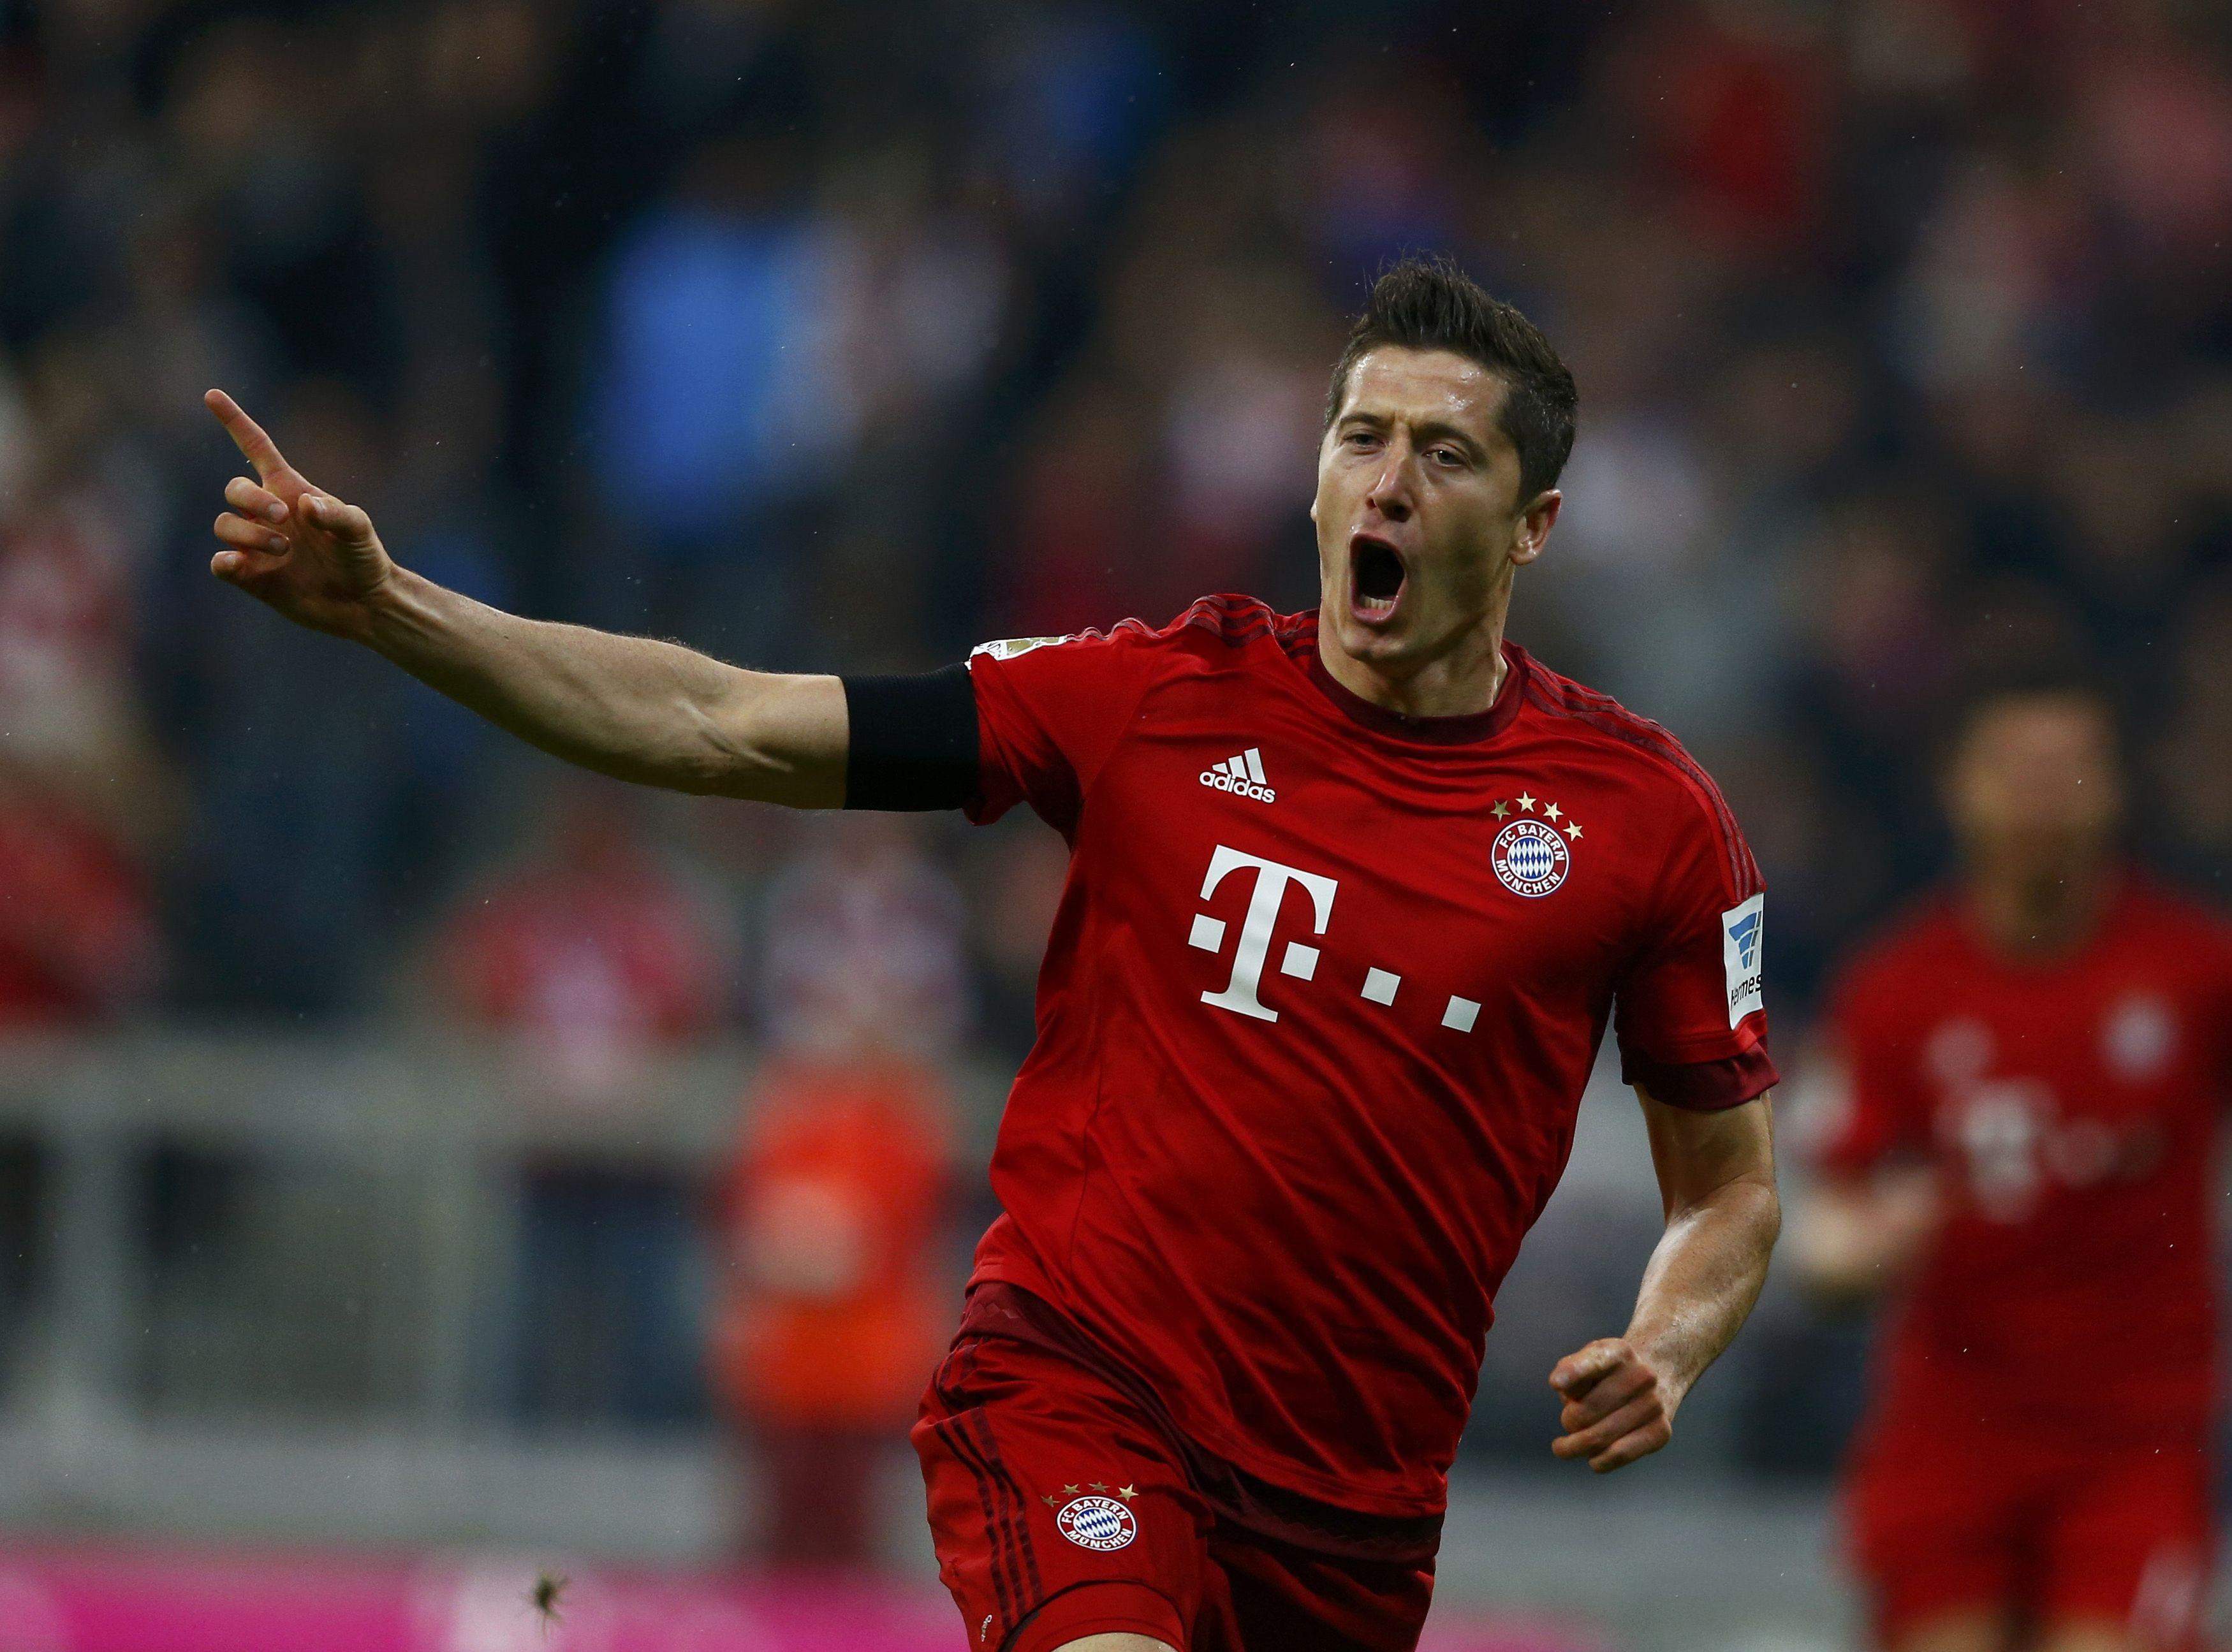 Bayern Munich's Robert Lewandowski reacts after scoring a goal during their German first division Bundesliga soccer match against Wolfsburg in Munich, September 22, 2015. Photo: Reuters